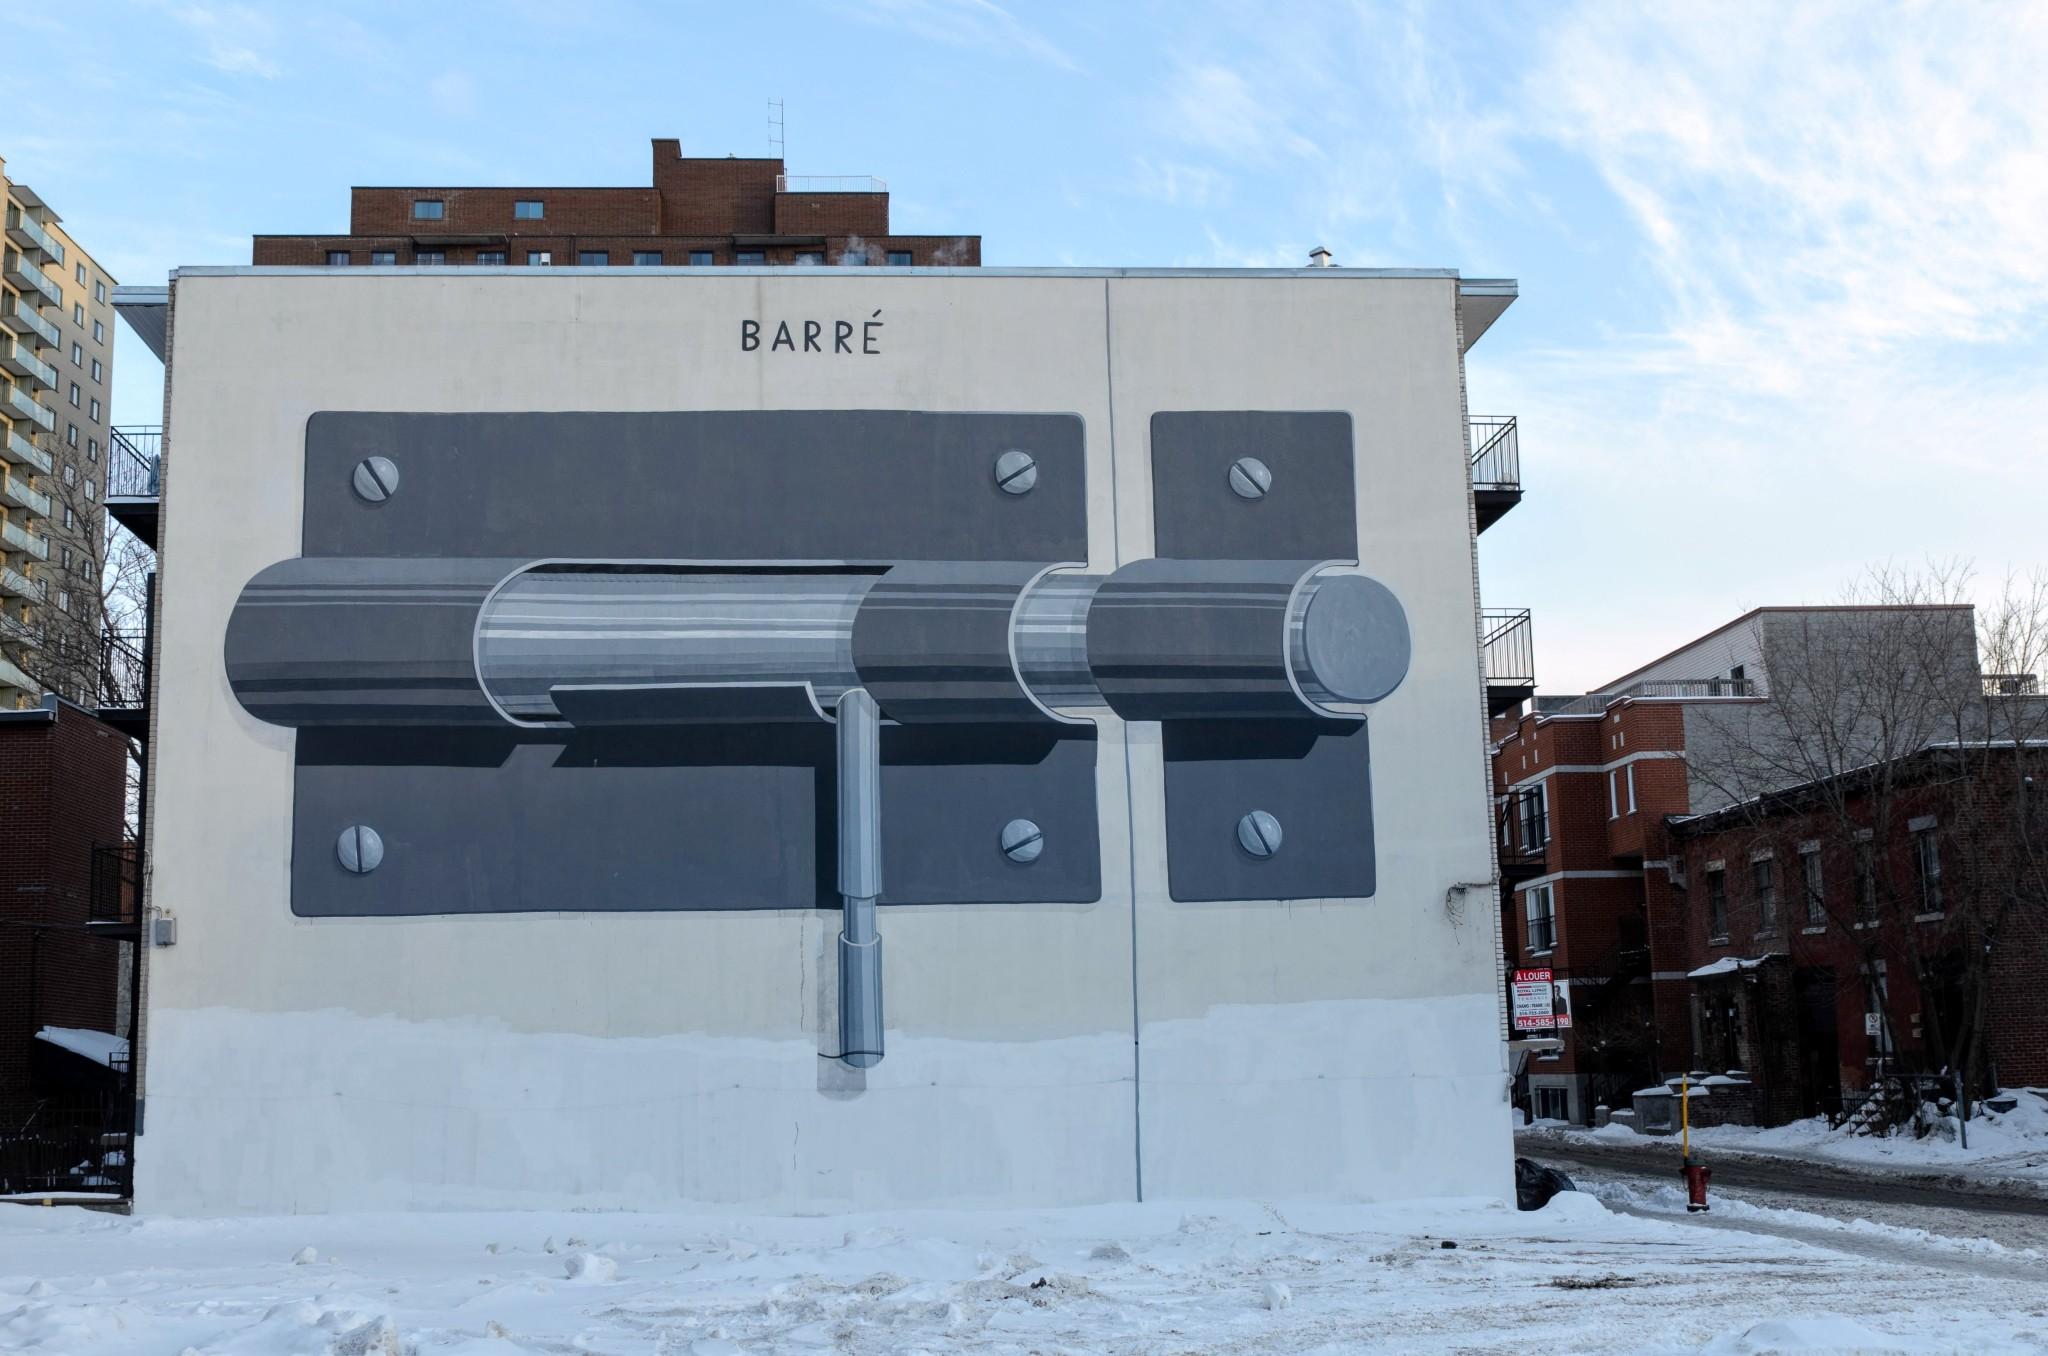 Murale: Barre', Montreal, regione del Quebec, Canada